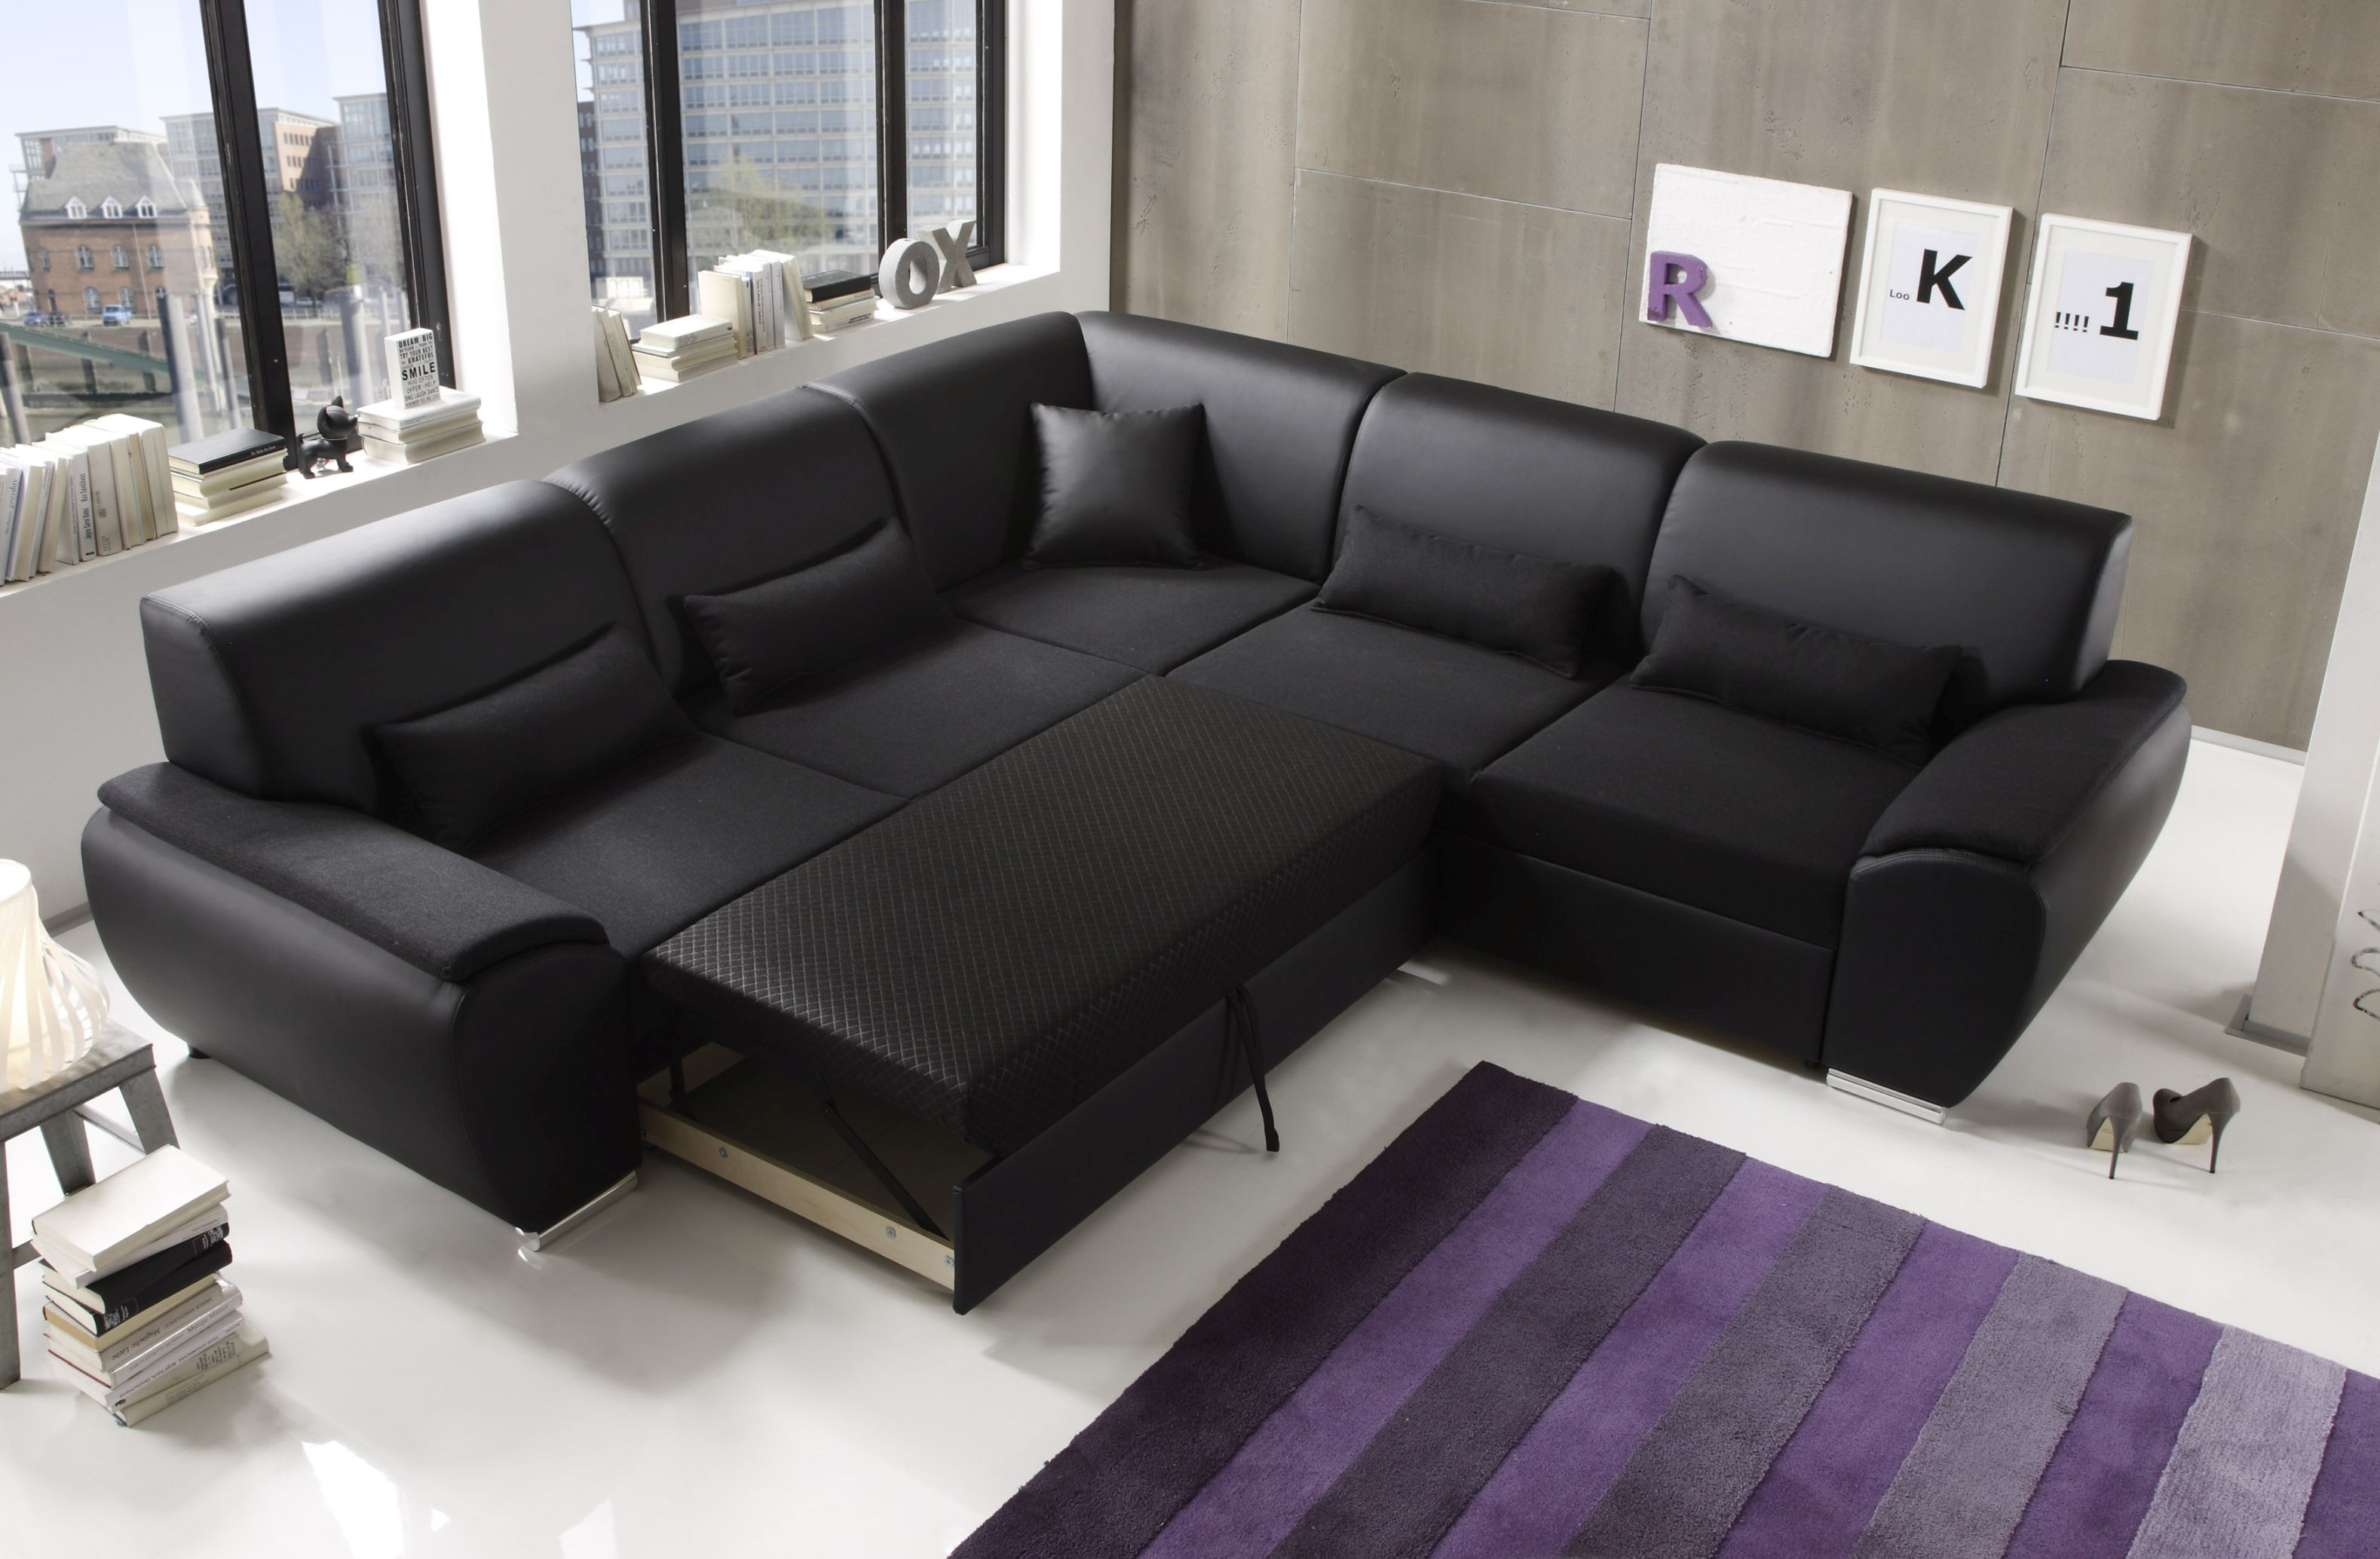 Ecksofa kombiecke couch schlafcouch funktionssofa for Schlafcouch ecksofa